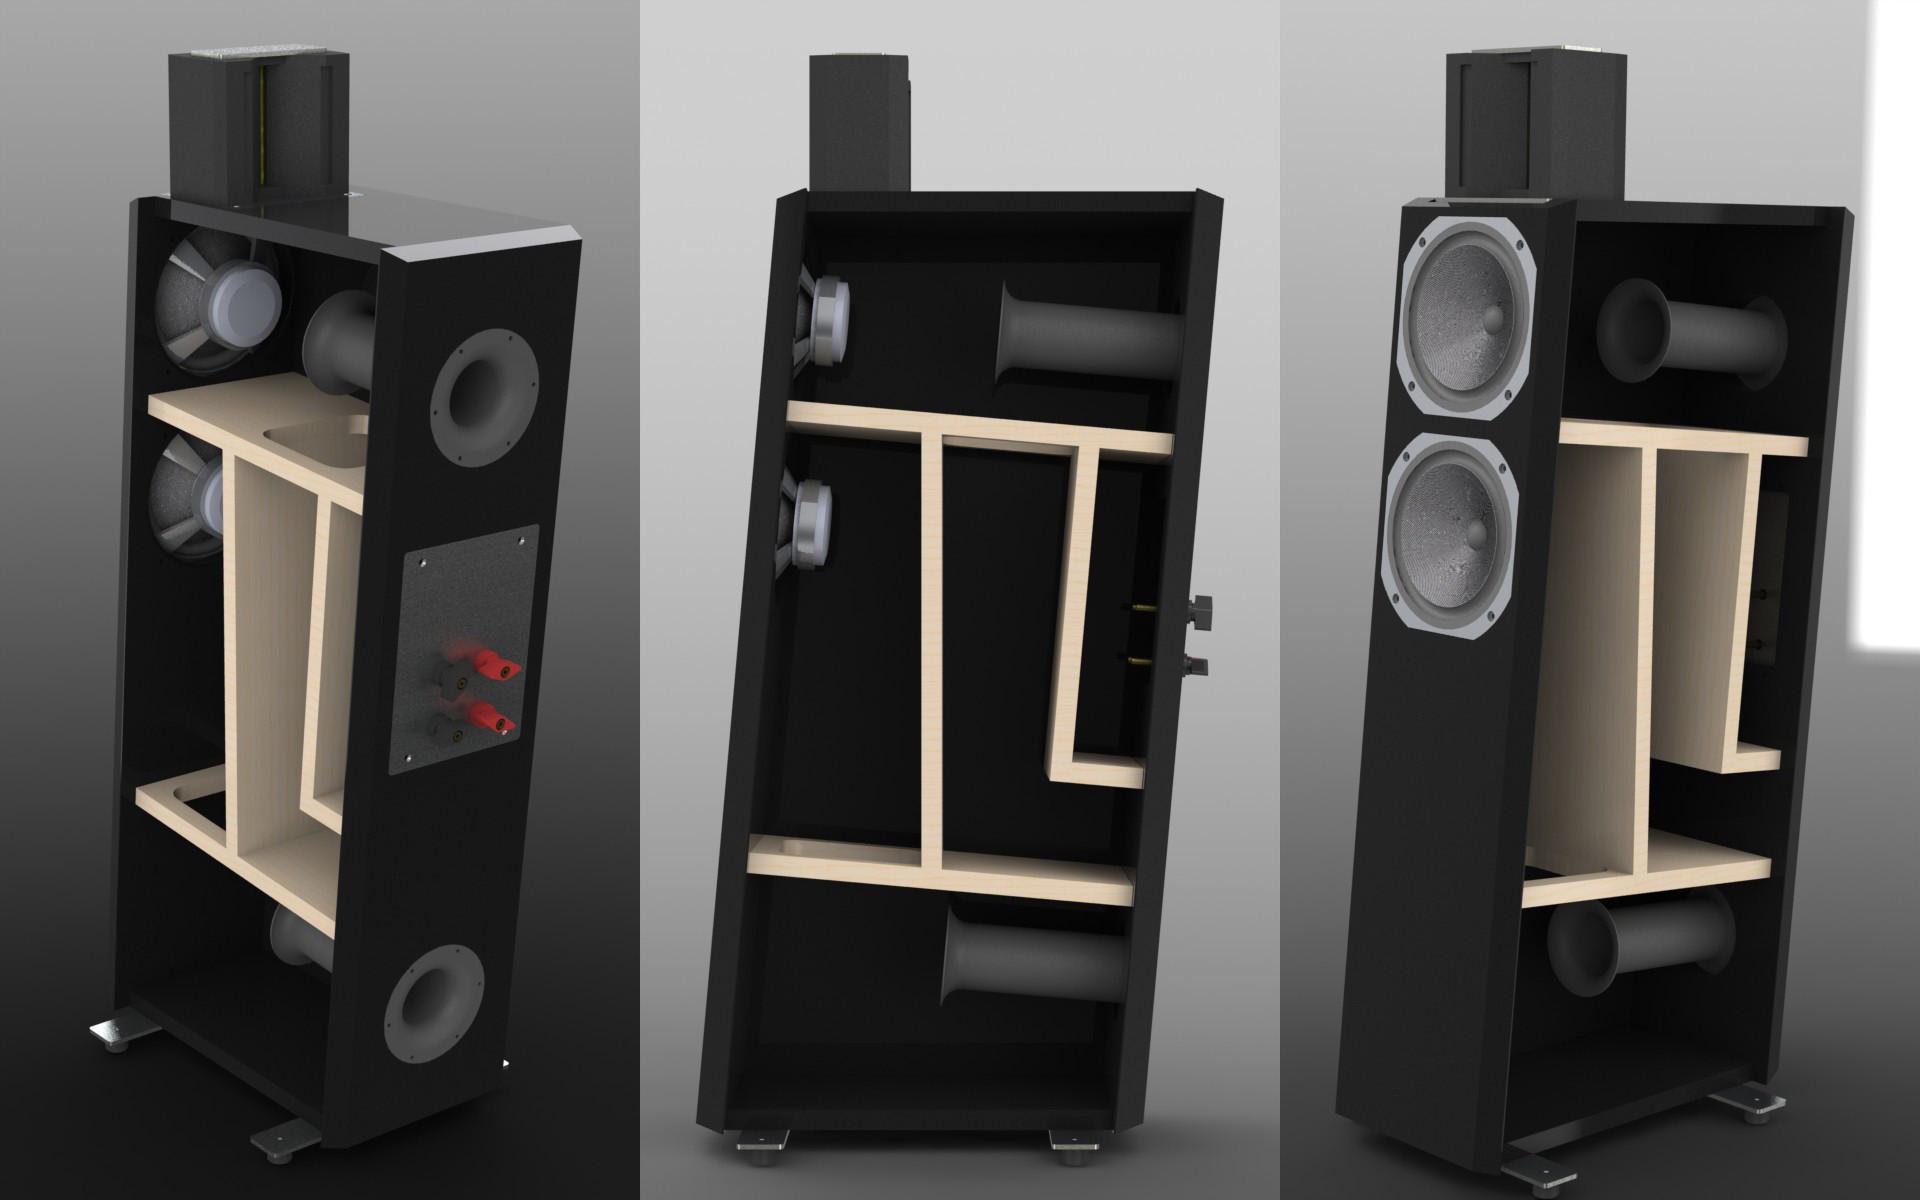 Lautsprecher Diy  Klang Ton Forum • Thema anzeigen [B] DIY Lautsprecher